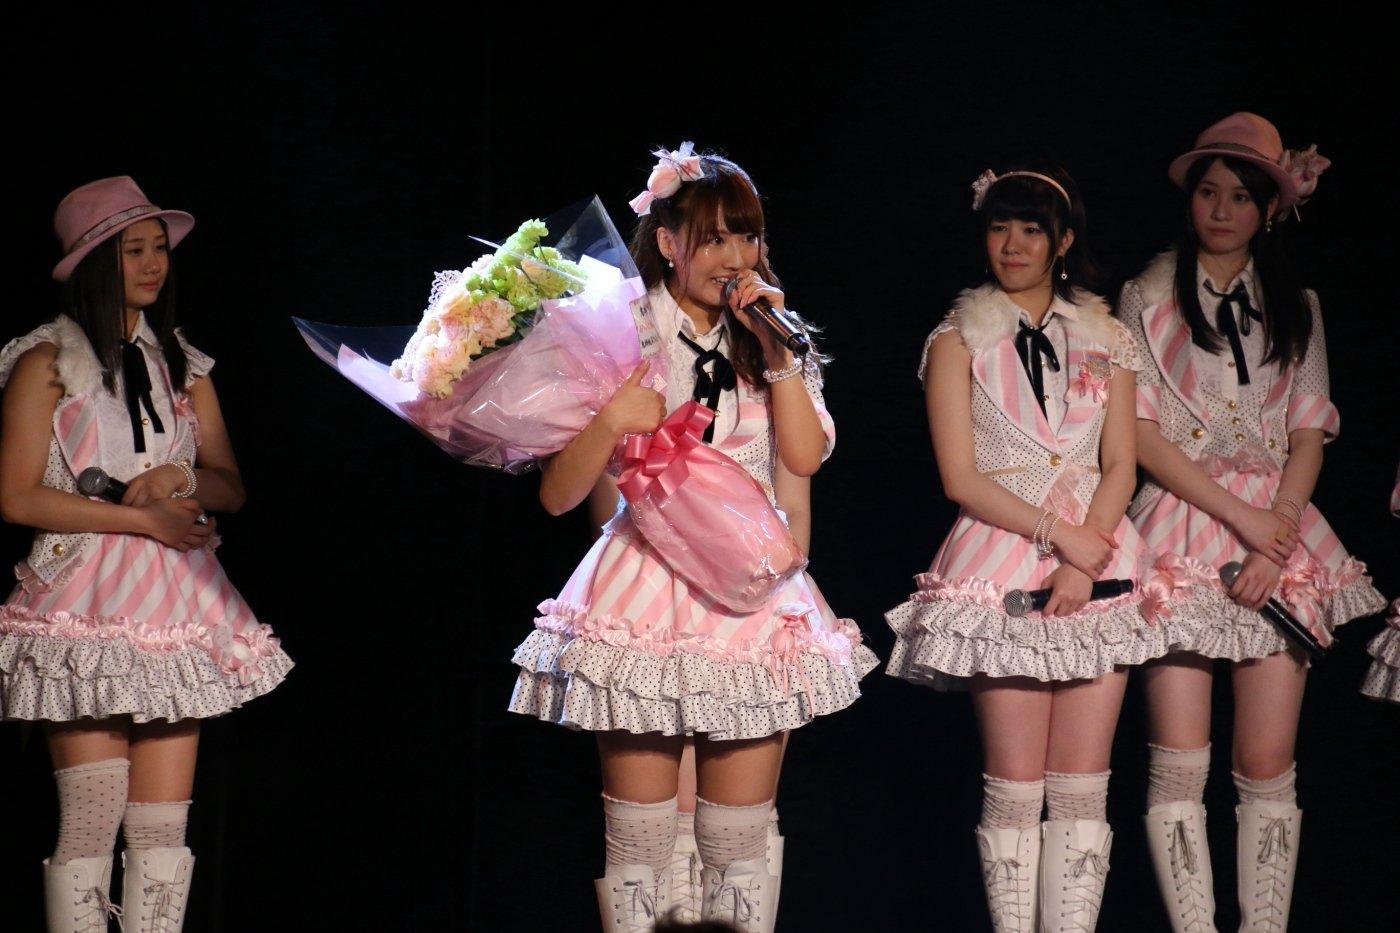 7 3 7.jpg?resize=1200,630 - akbグループのメンバーだった鬼頭桃菜が卒業後にセクシー女優として大活躍している